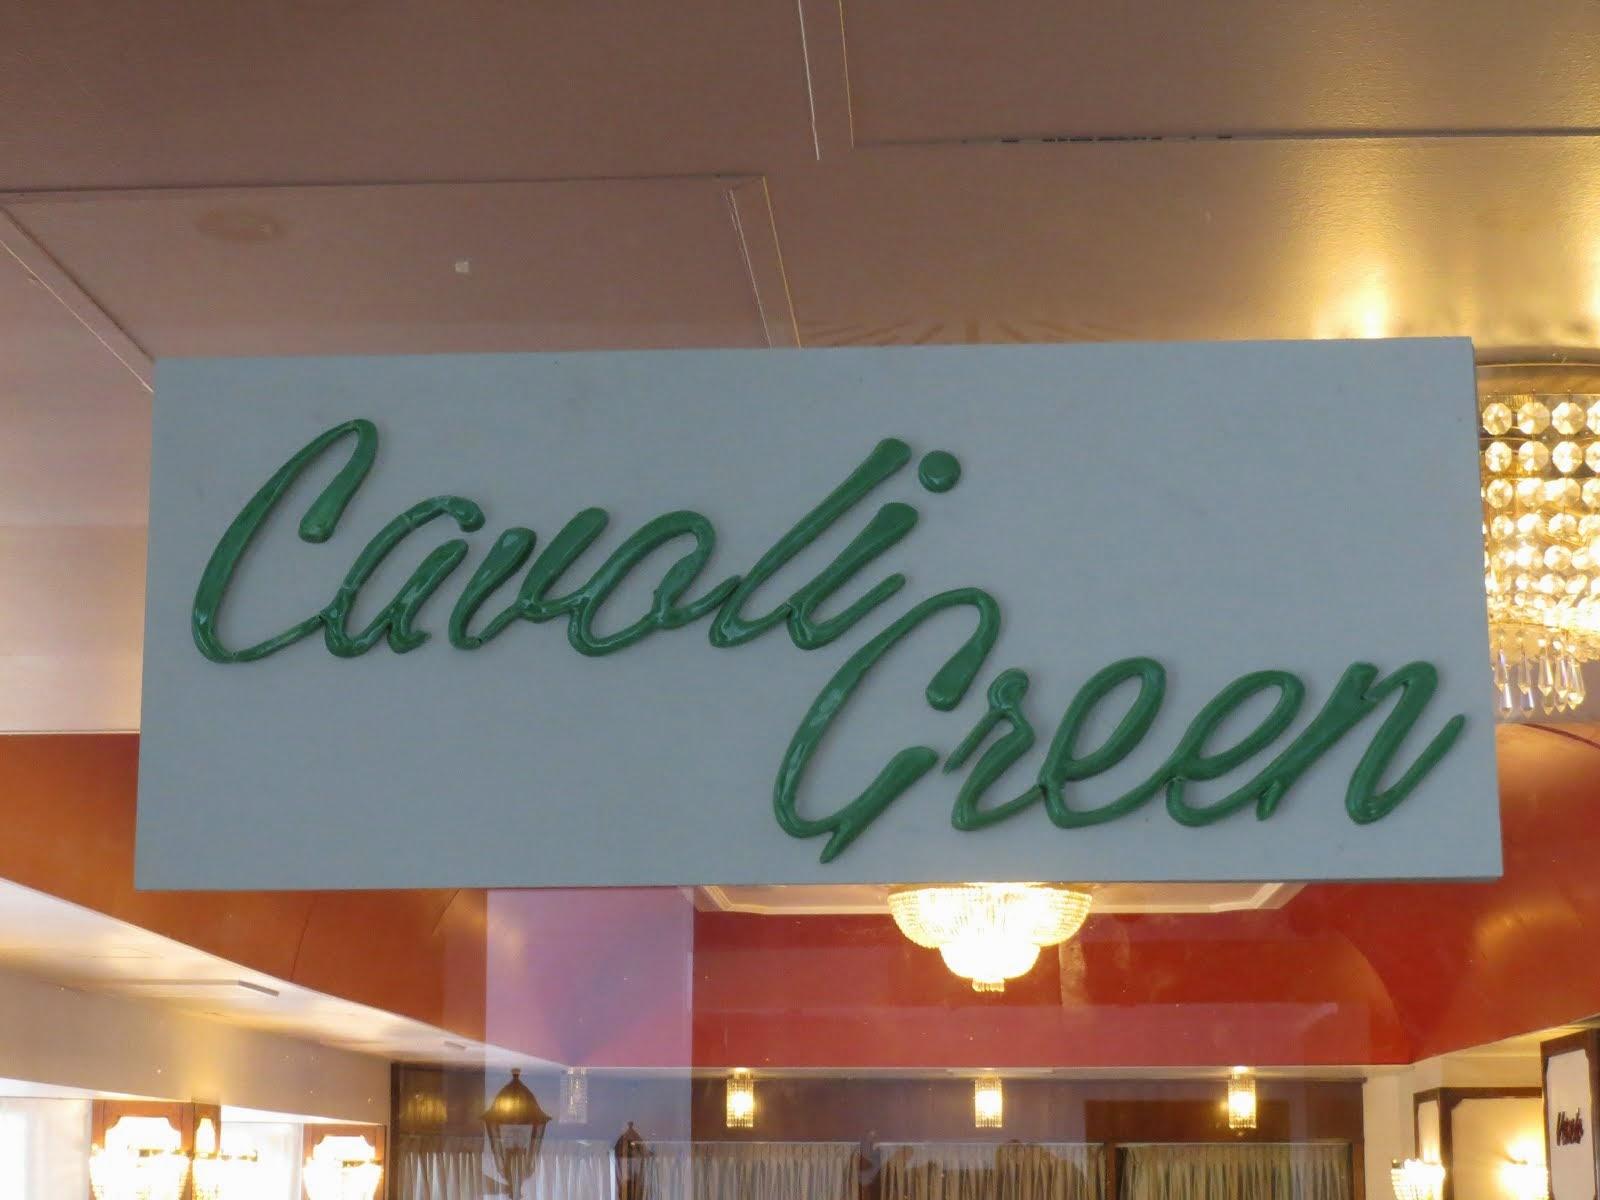 cavoli green